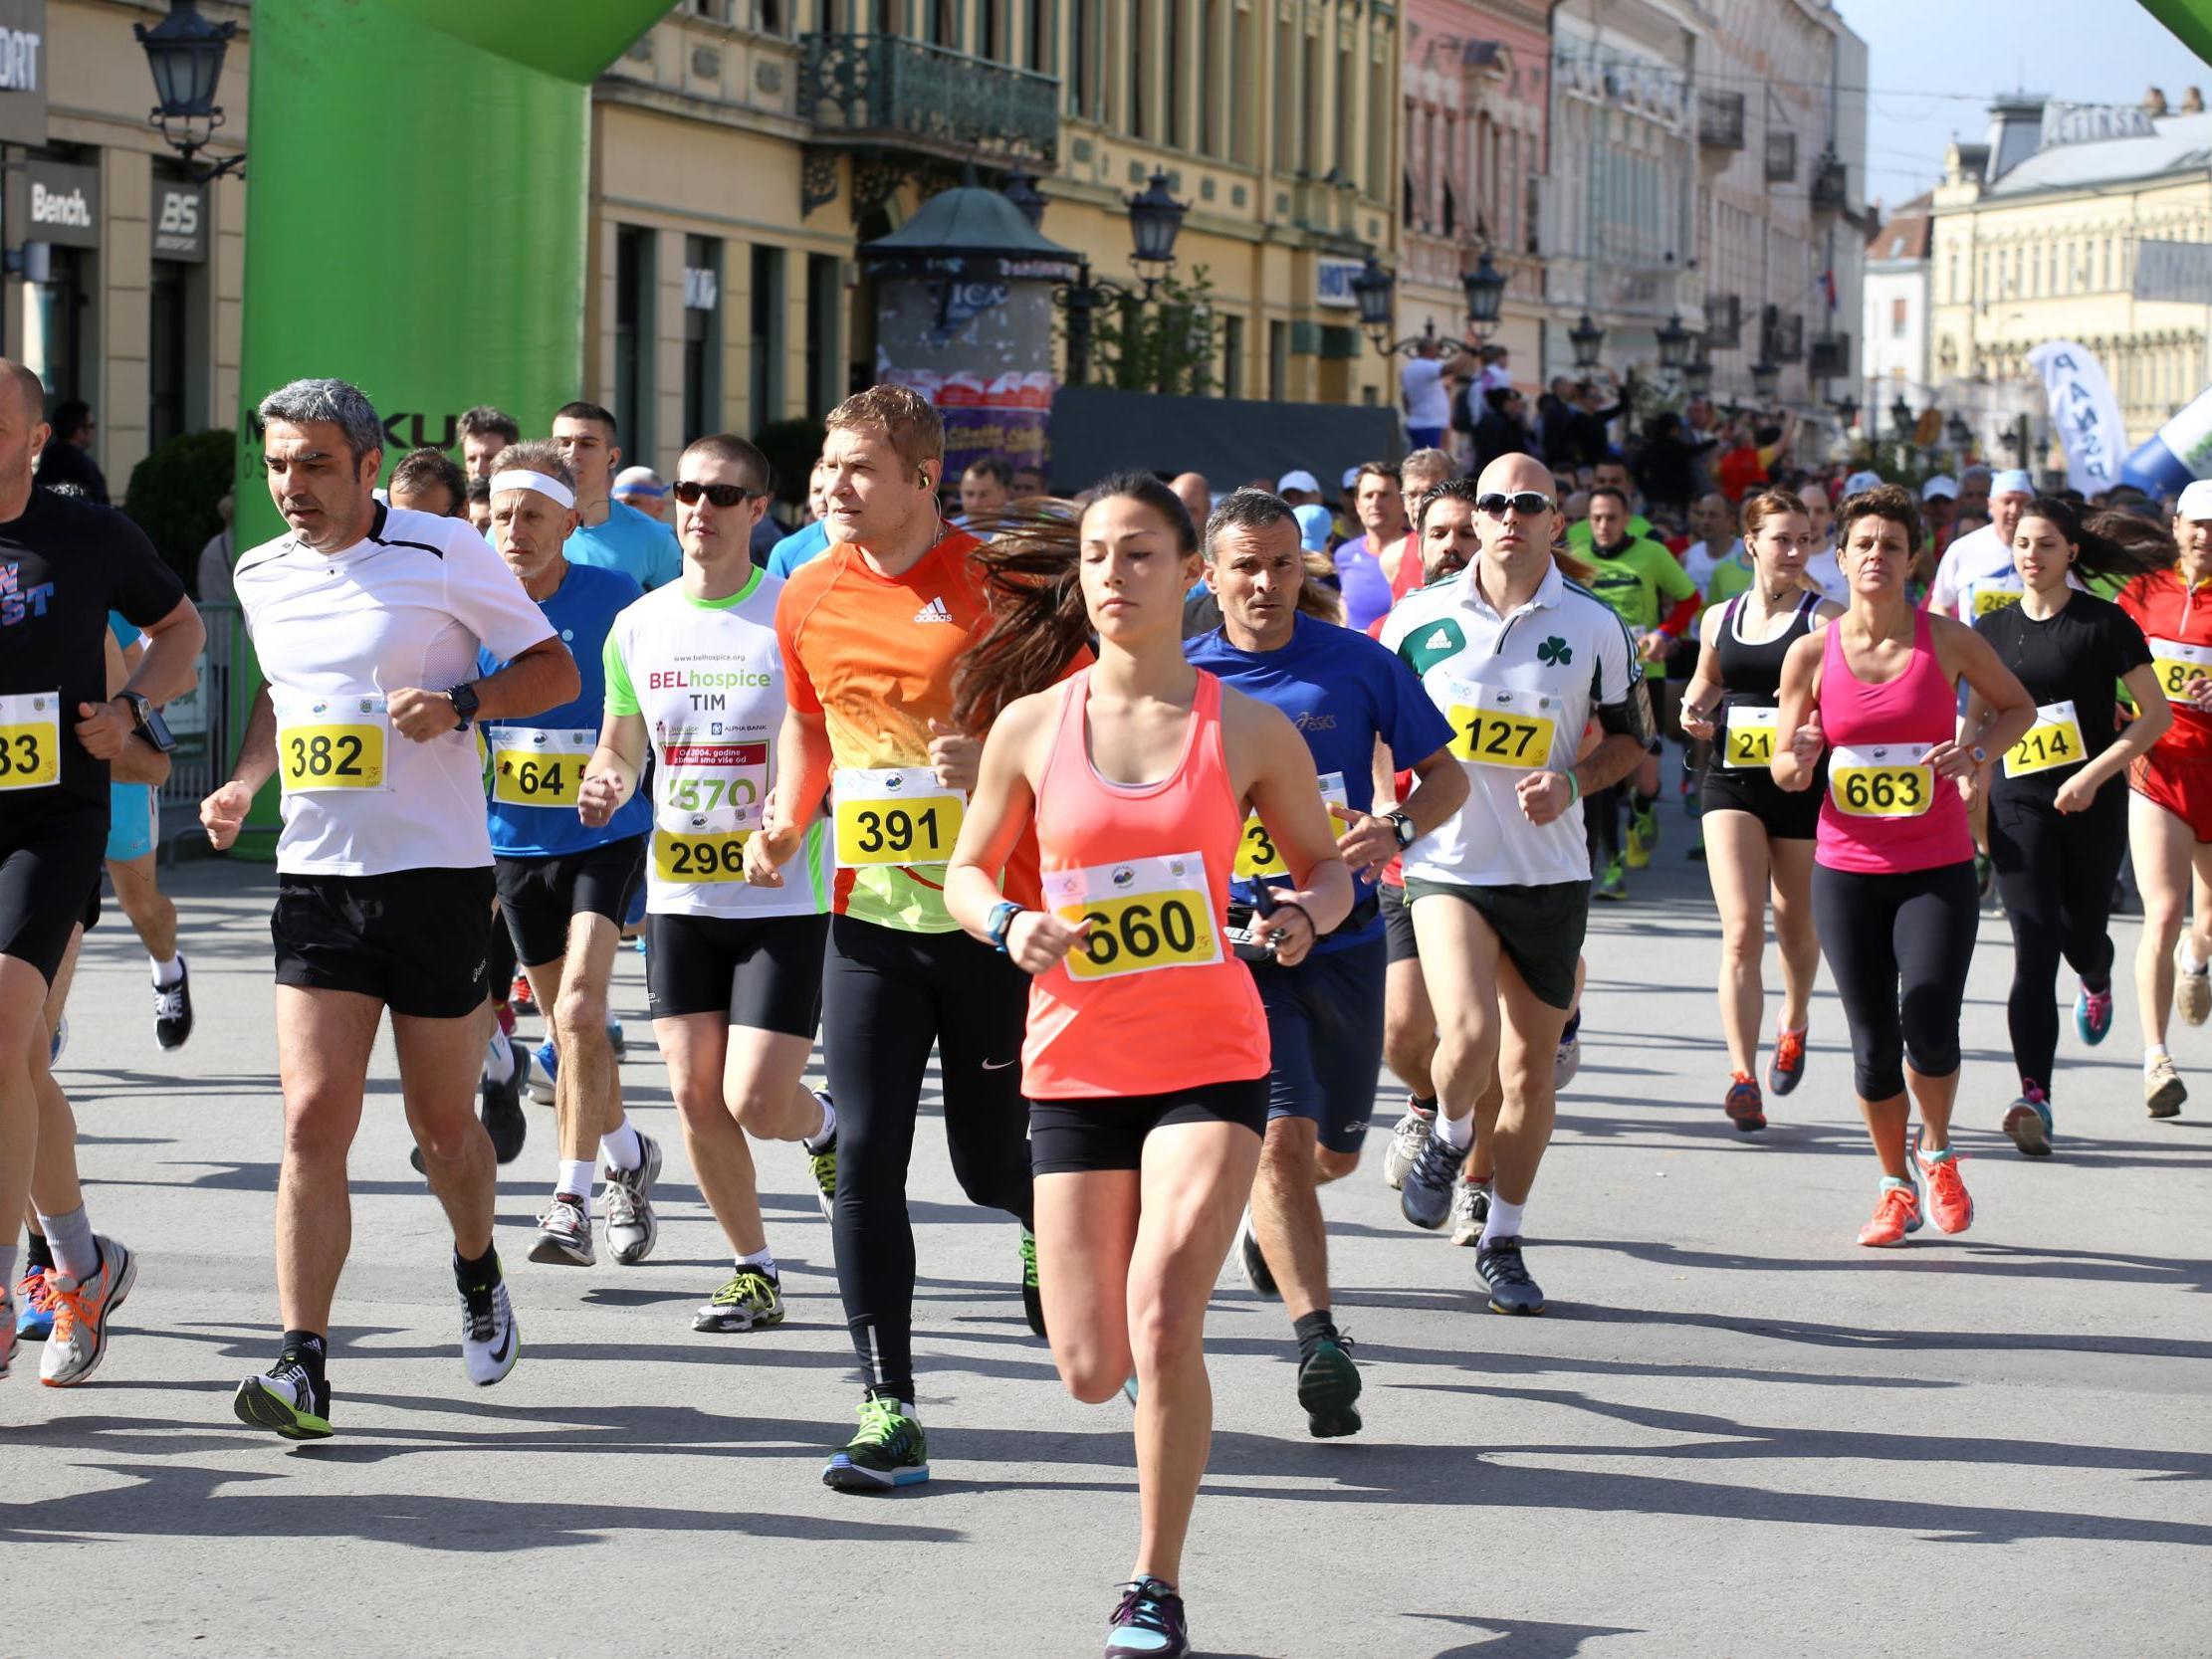 Great Eastern Run: 'Misinterpretation' triggers cancellation of half marathon after man seen acting 'suspiciously'